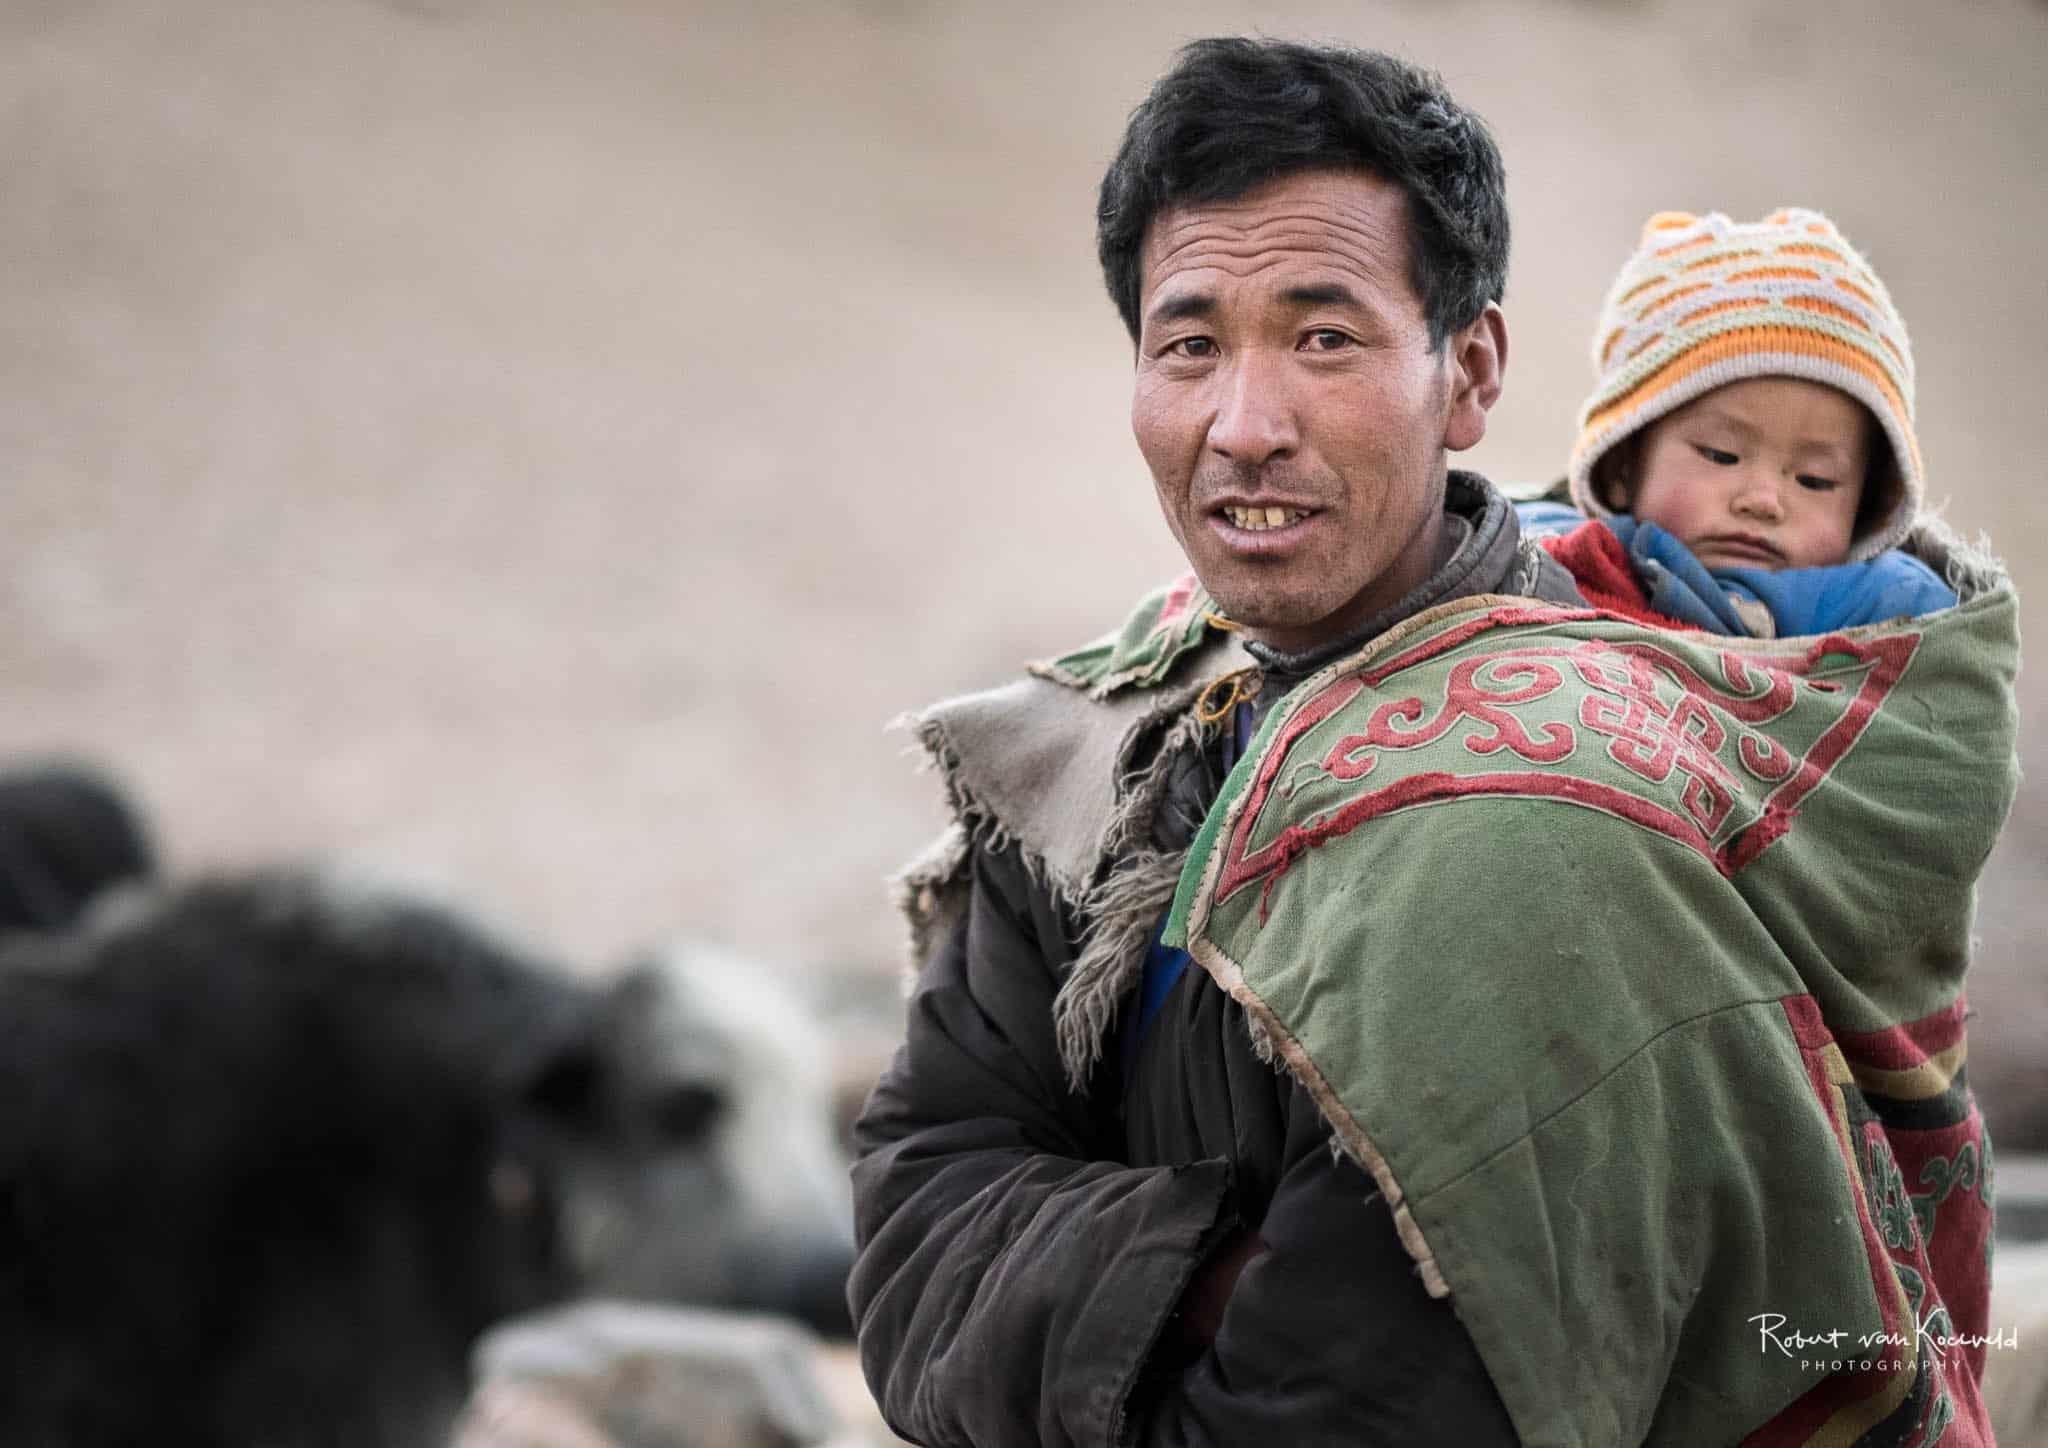 Ladakh Photo Tour With Robert Van Koesveld